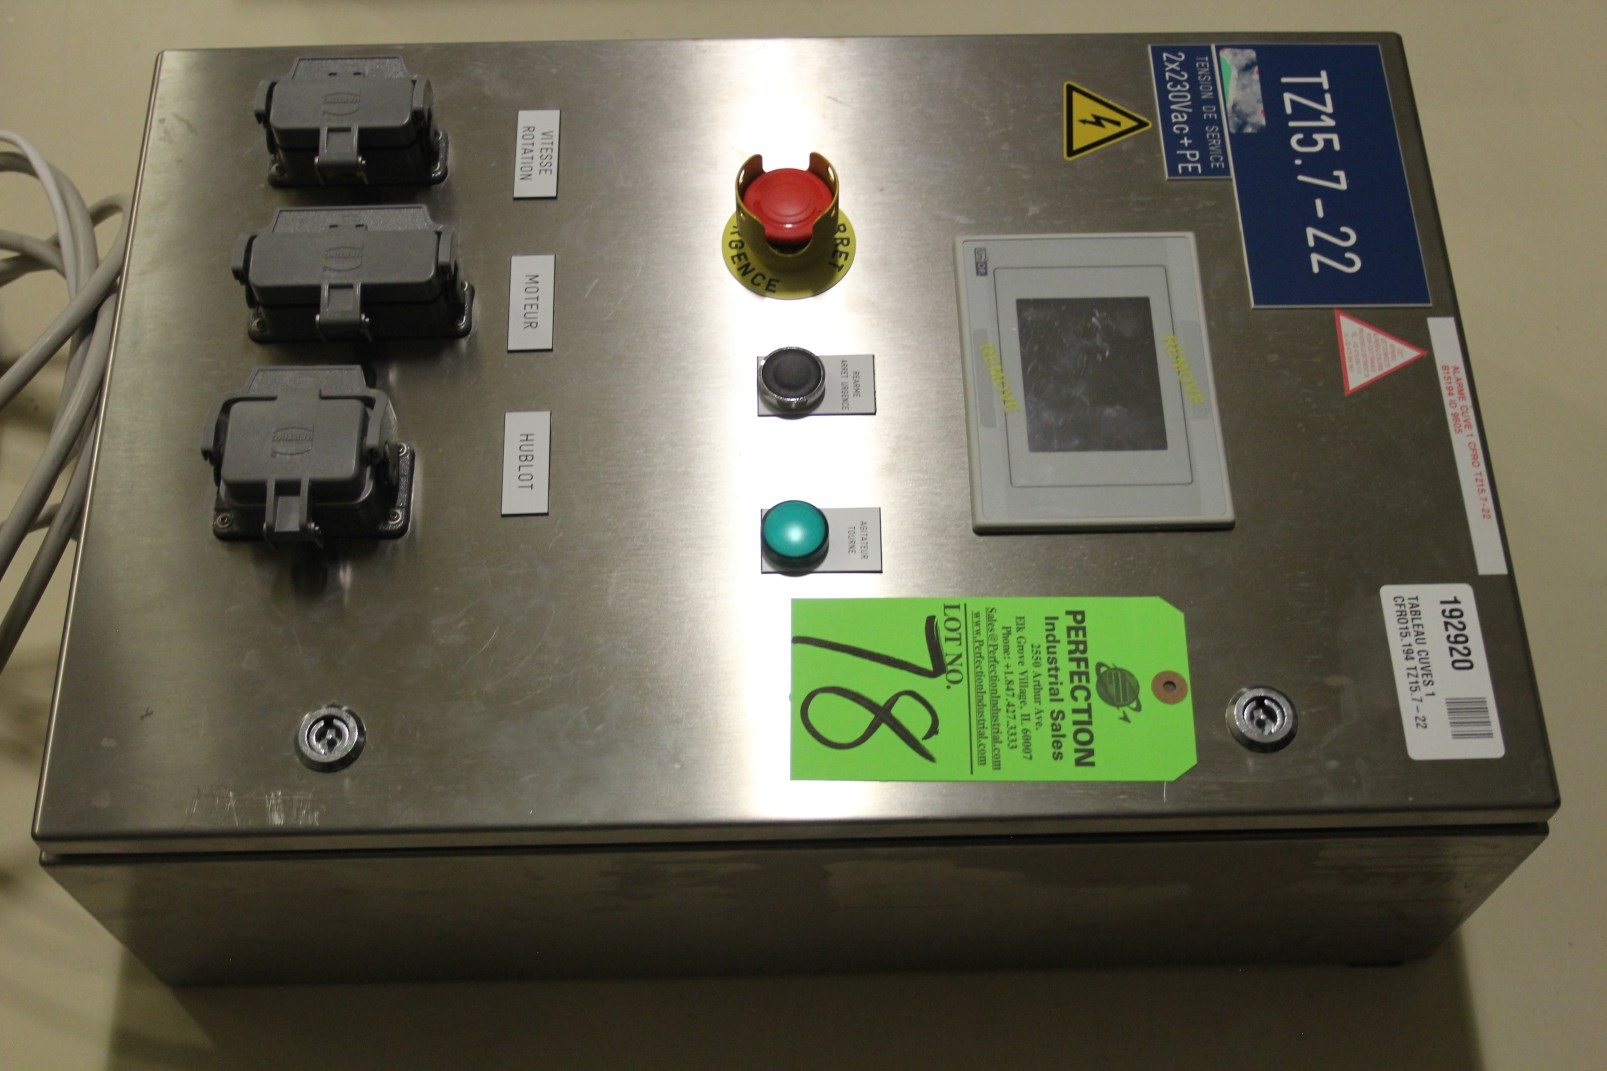 Lot 78 - Siabt UniOp PLC Control for Vessel